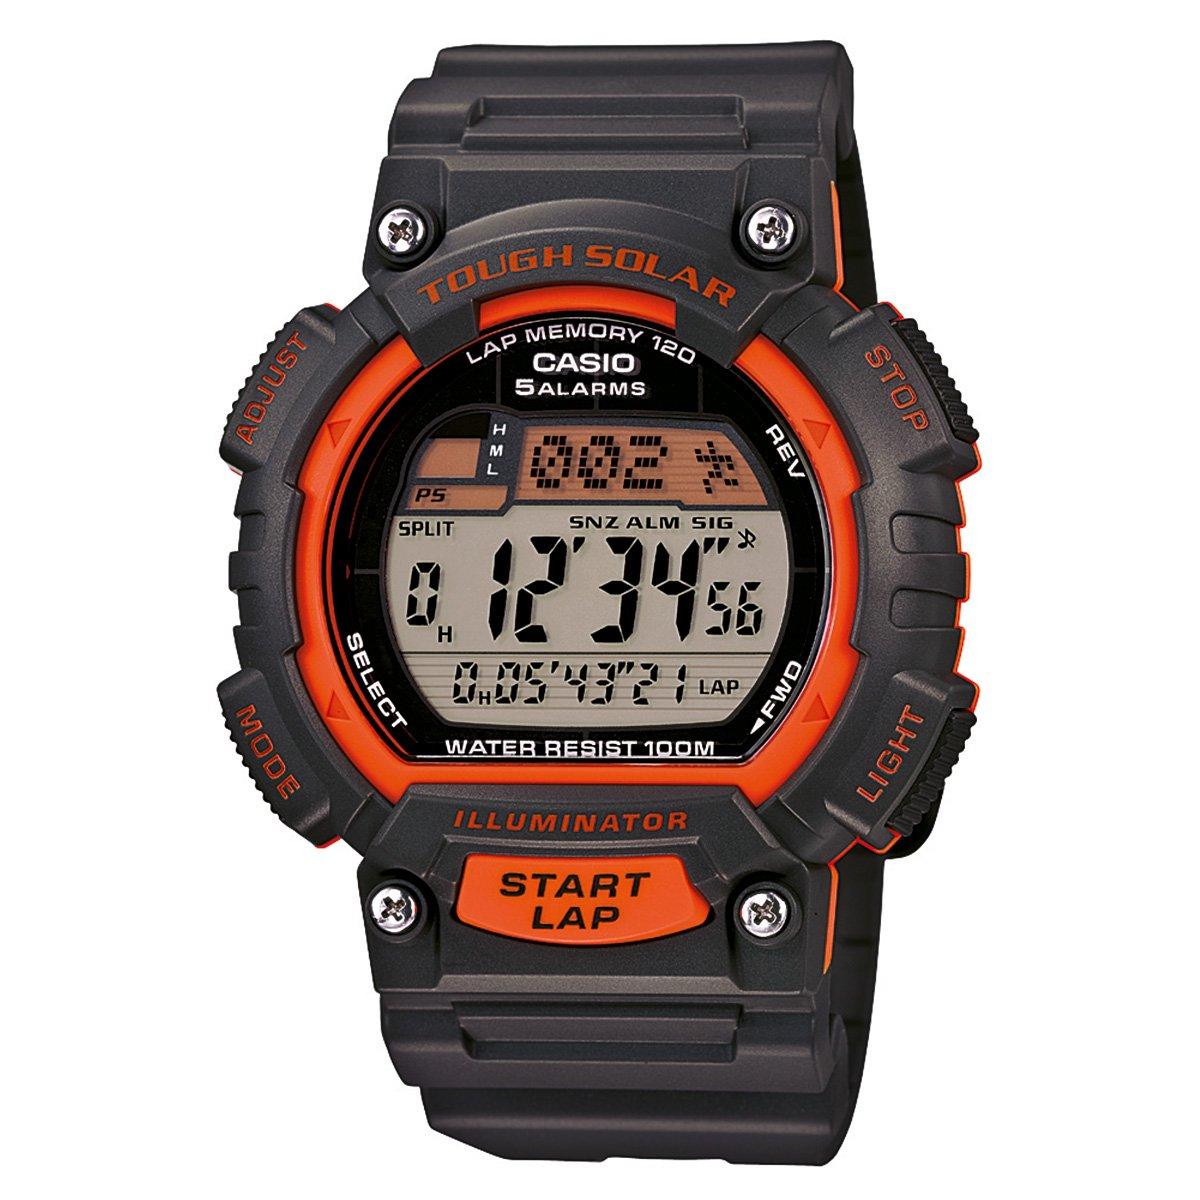 ce2baa6e66d Relógio Casio Digital STL-S100H - Preto e Laranja - Compre Agora ...